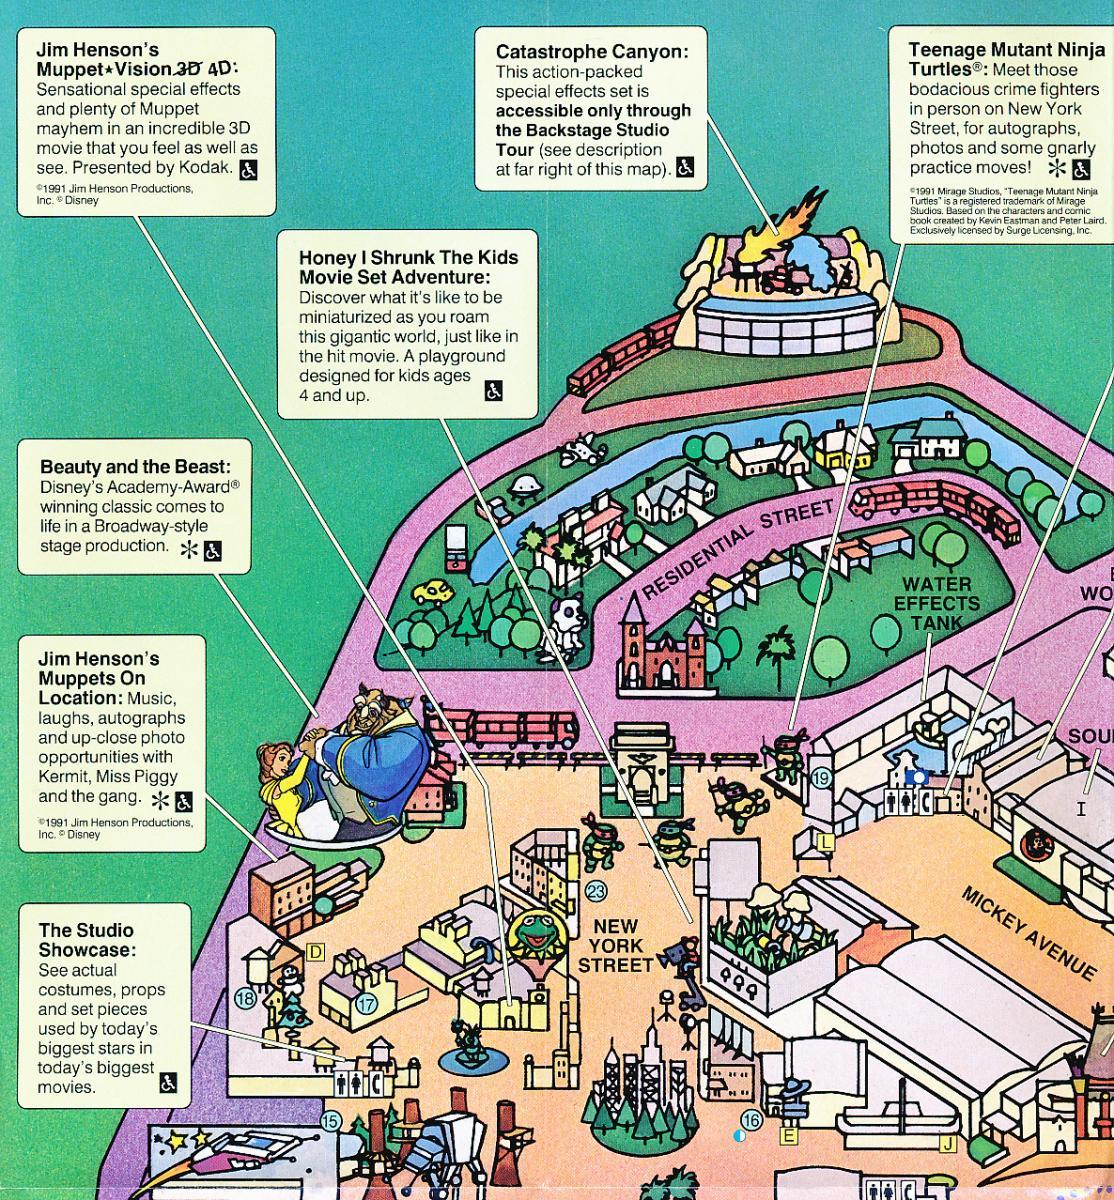 Disney-MGM Studios Park Map from 1993 - studioscentral.com on map of disneyland paris studios, map of pixar studios, map of disney universal studios, map of animation studios,